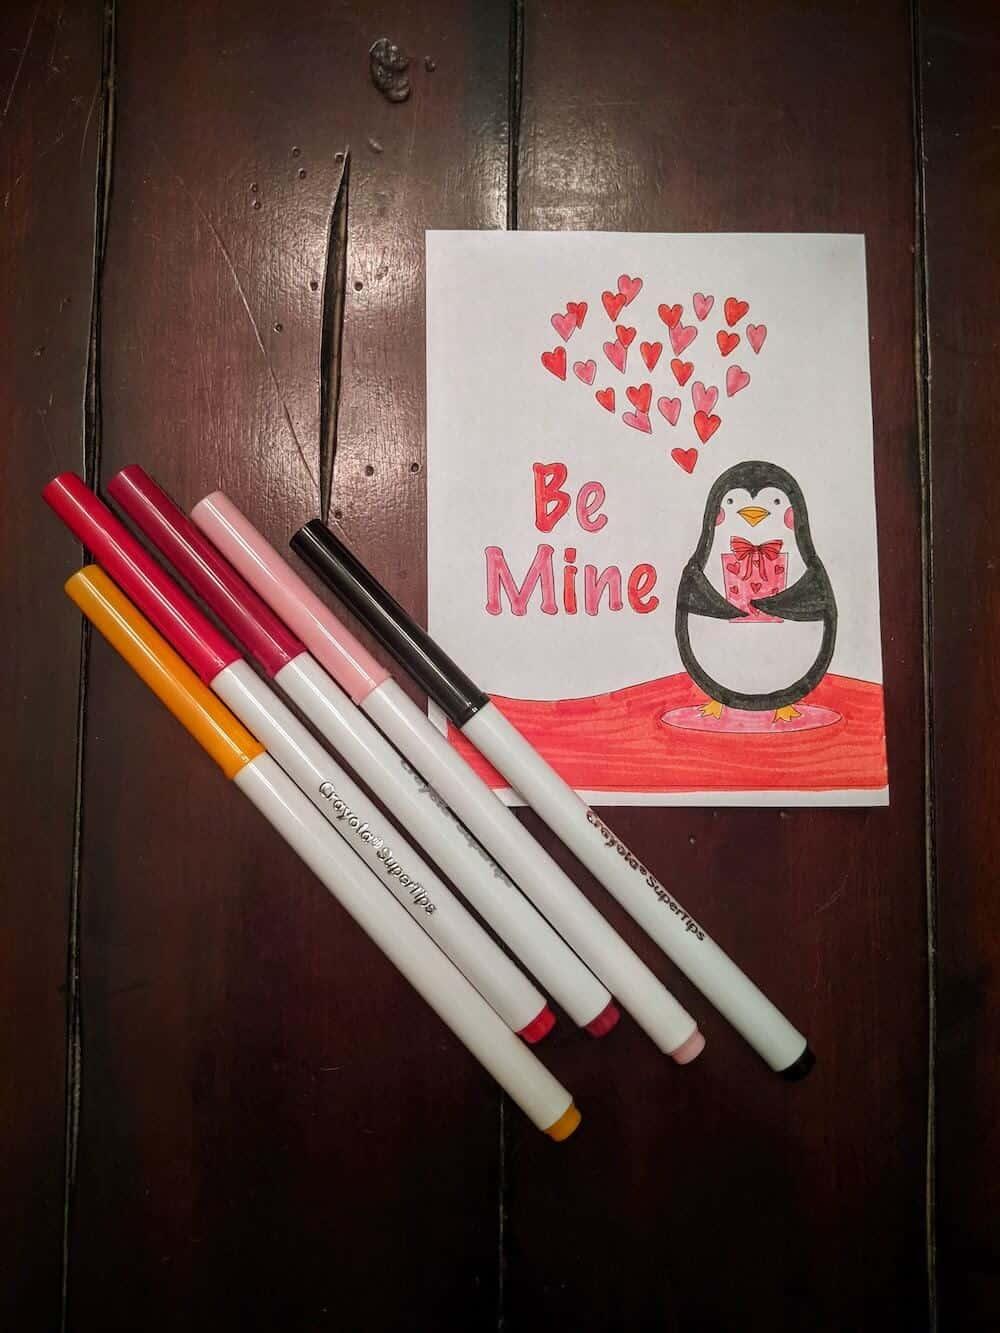 Penguine Valentie's Day card saying